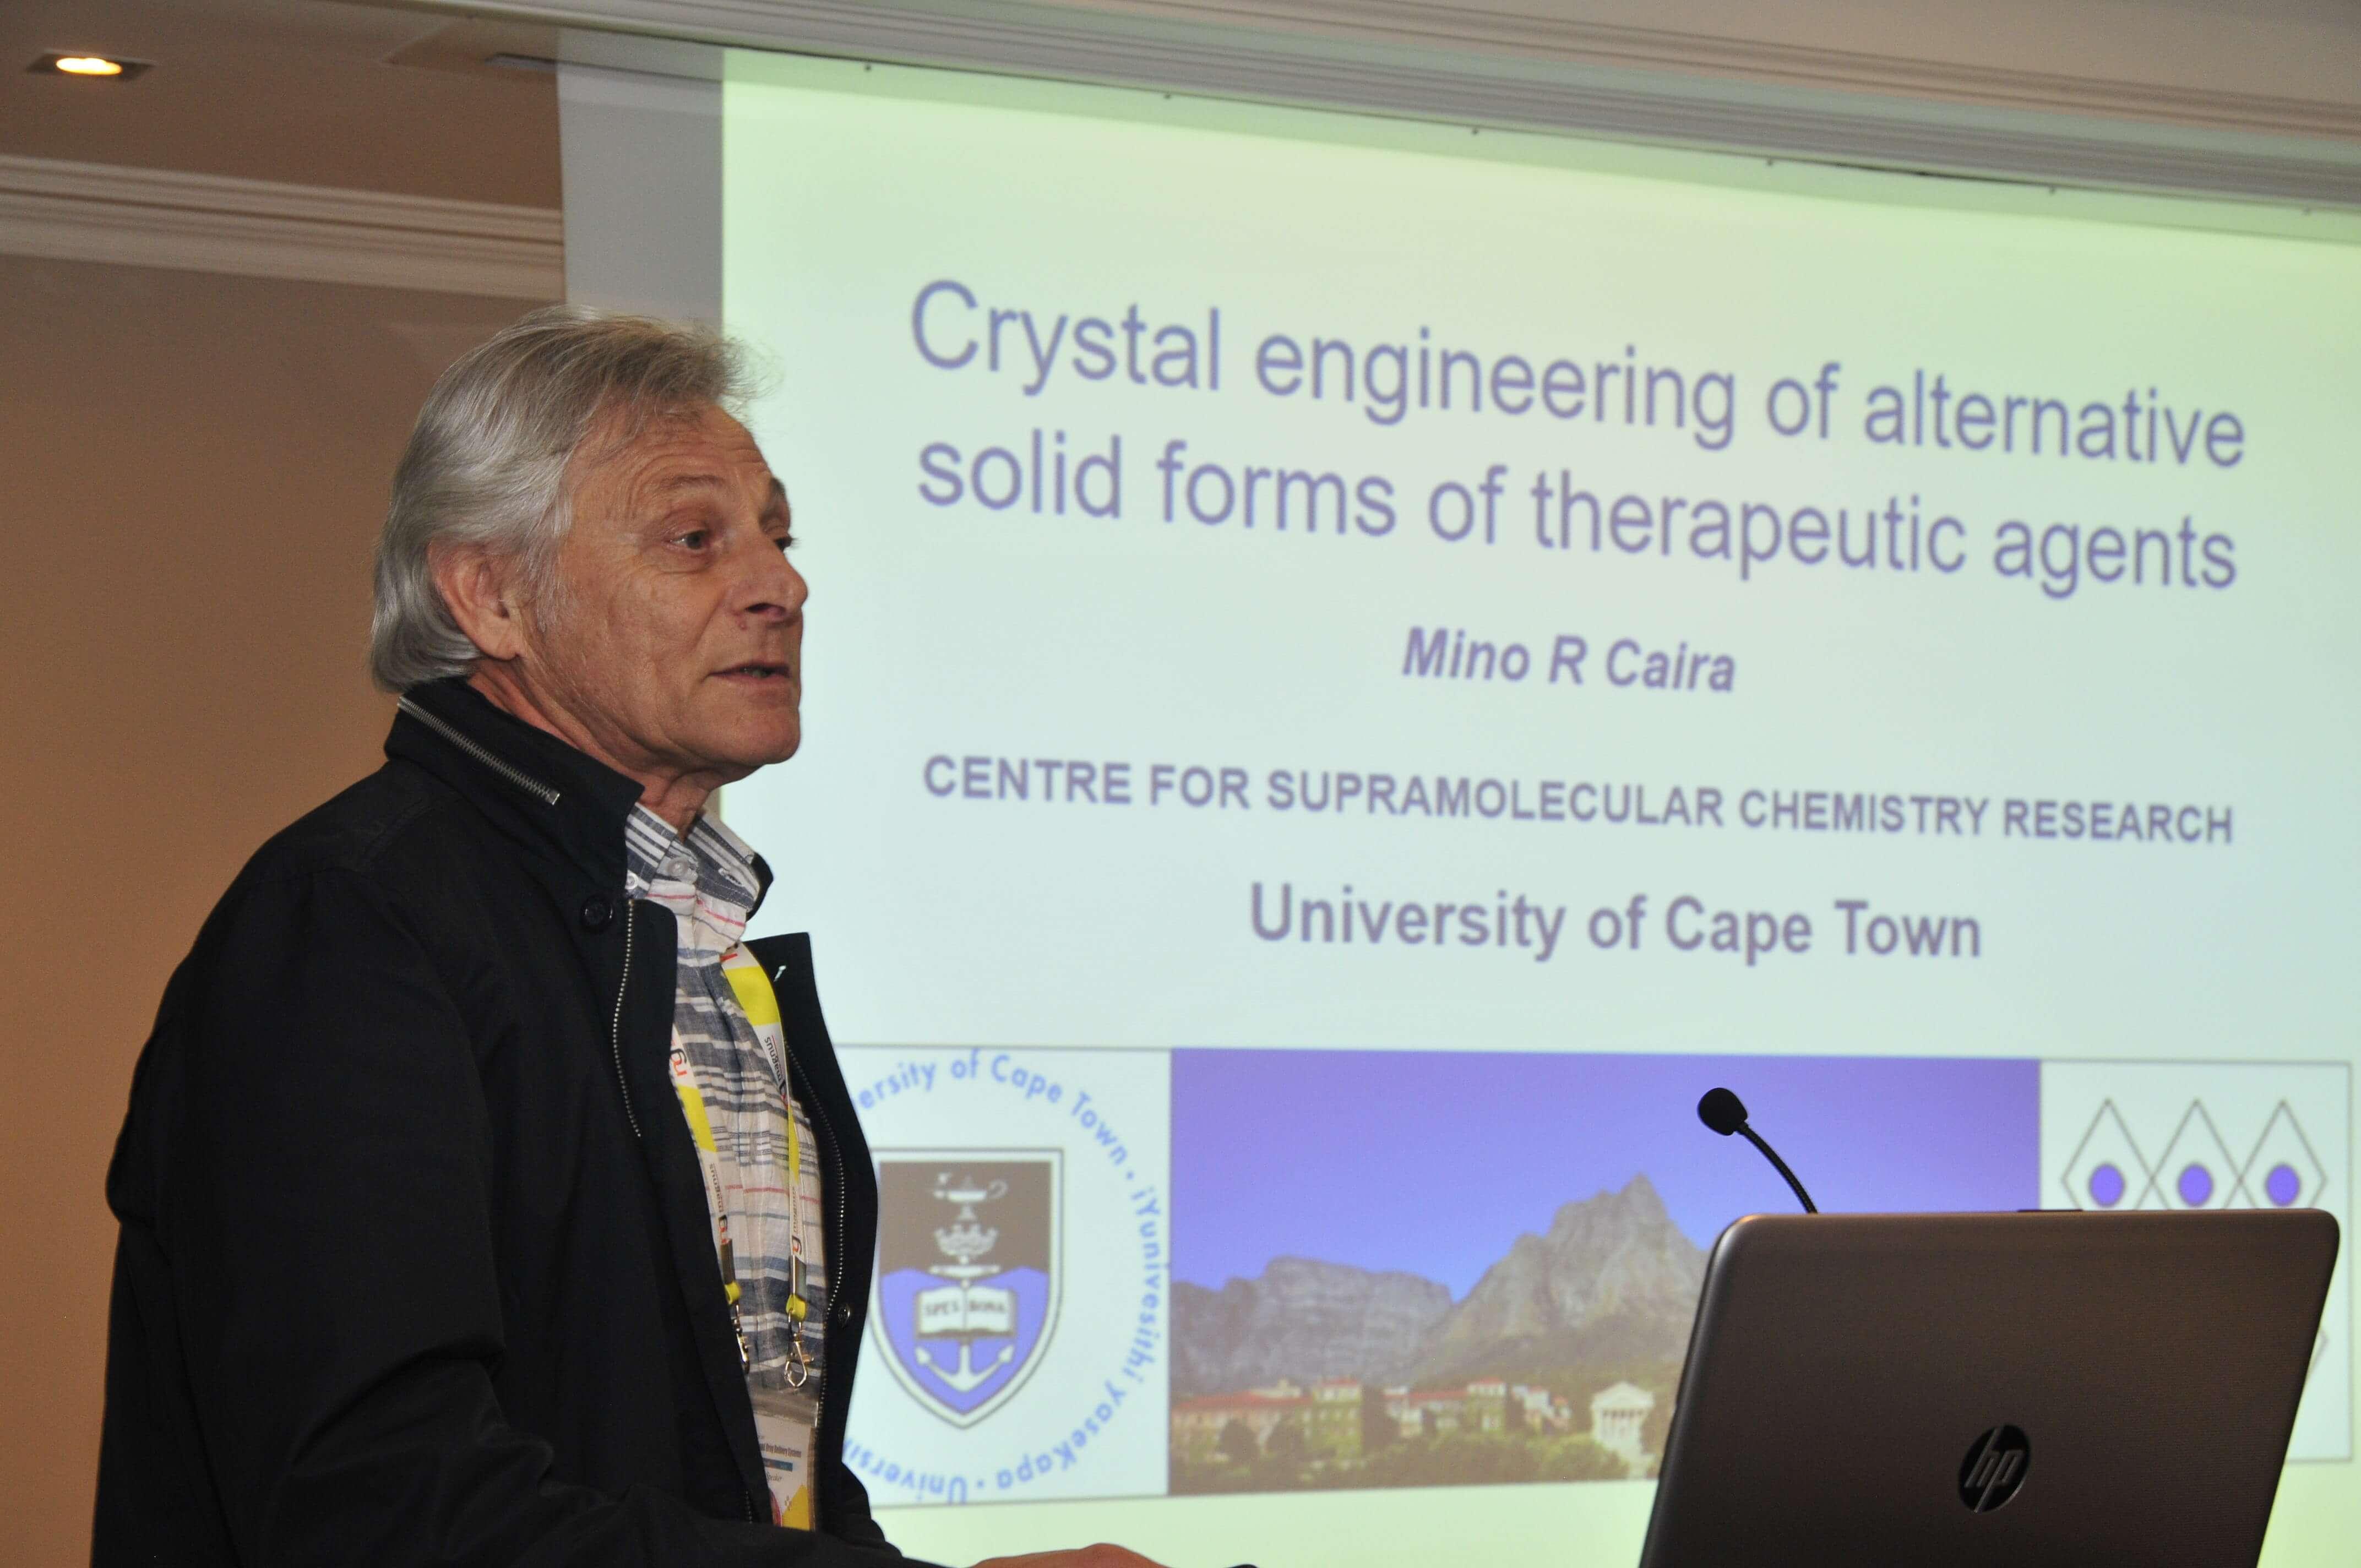 Potential speakers for Pharma 2020-Mino R. Caira